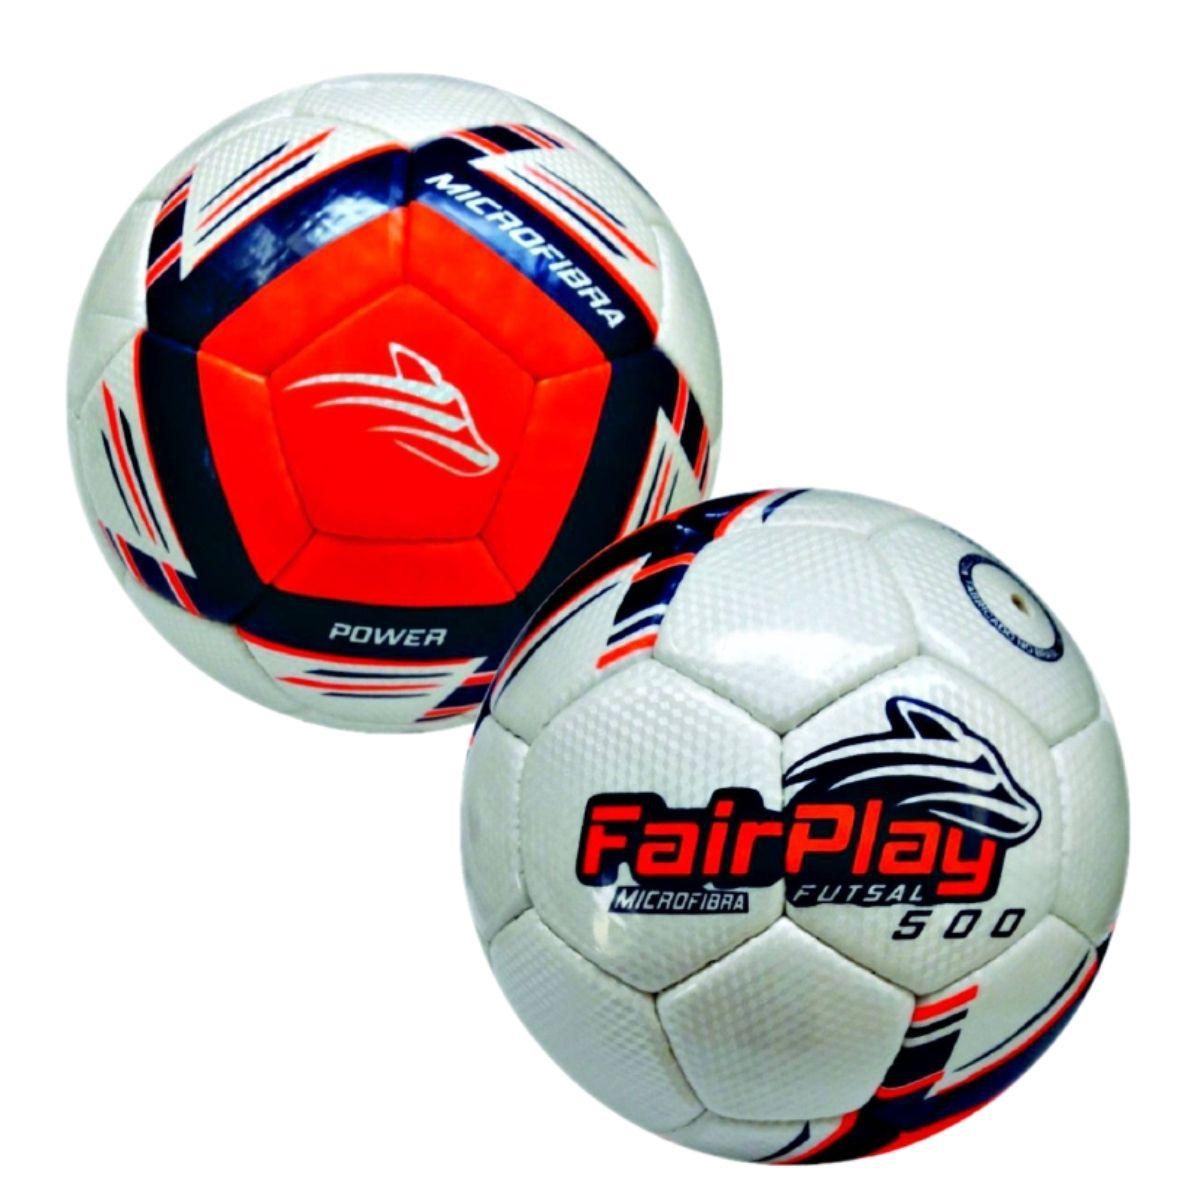 Kit 2 Bolas Futsal Fairplay Power 500